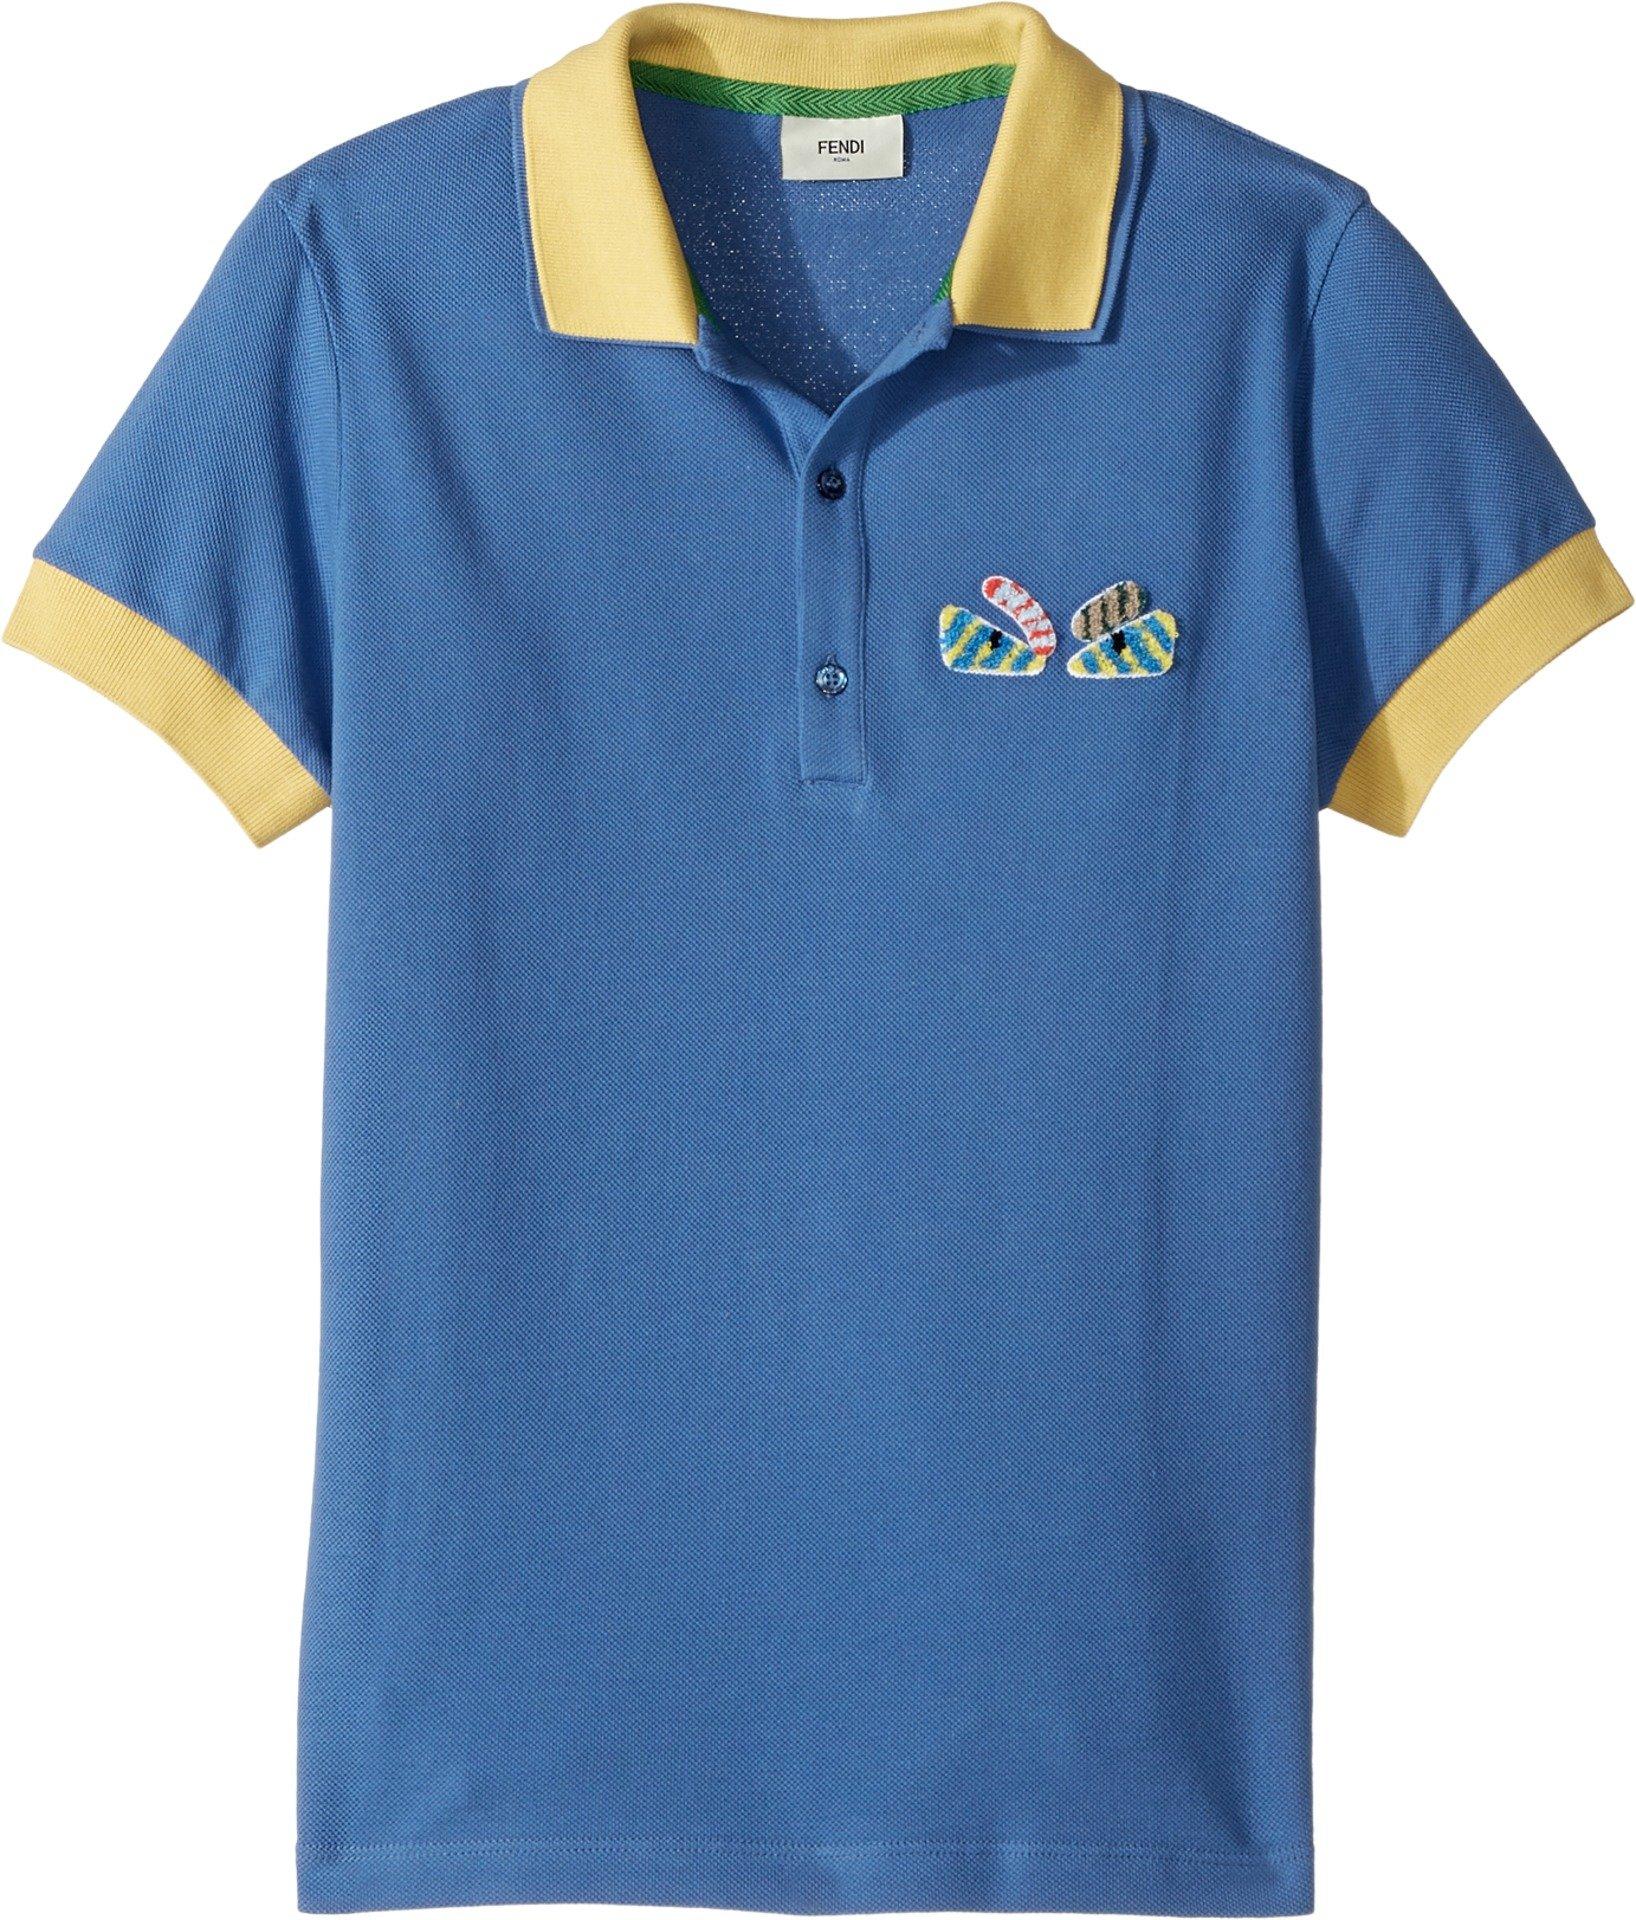 Fendi Kids  Boy's Short Sleeve Polo w/ Monster Eyes Detail on Front (Big Kids) Blue Shirt by Fendi Kids